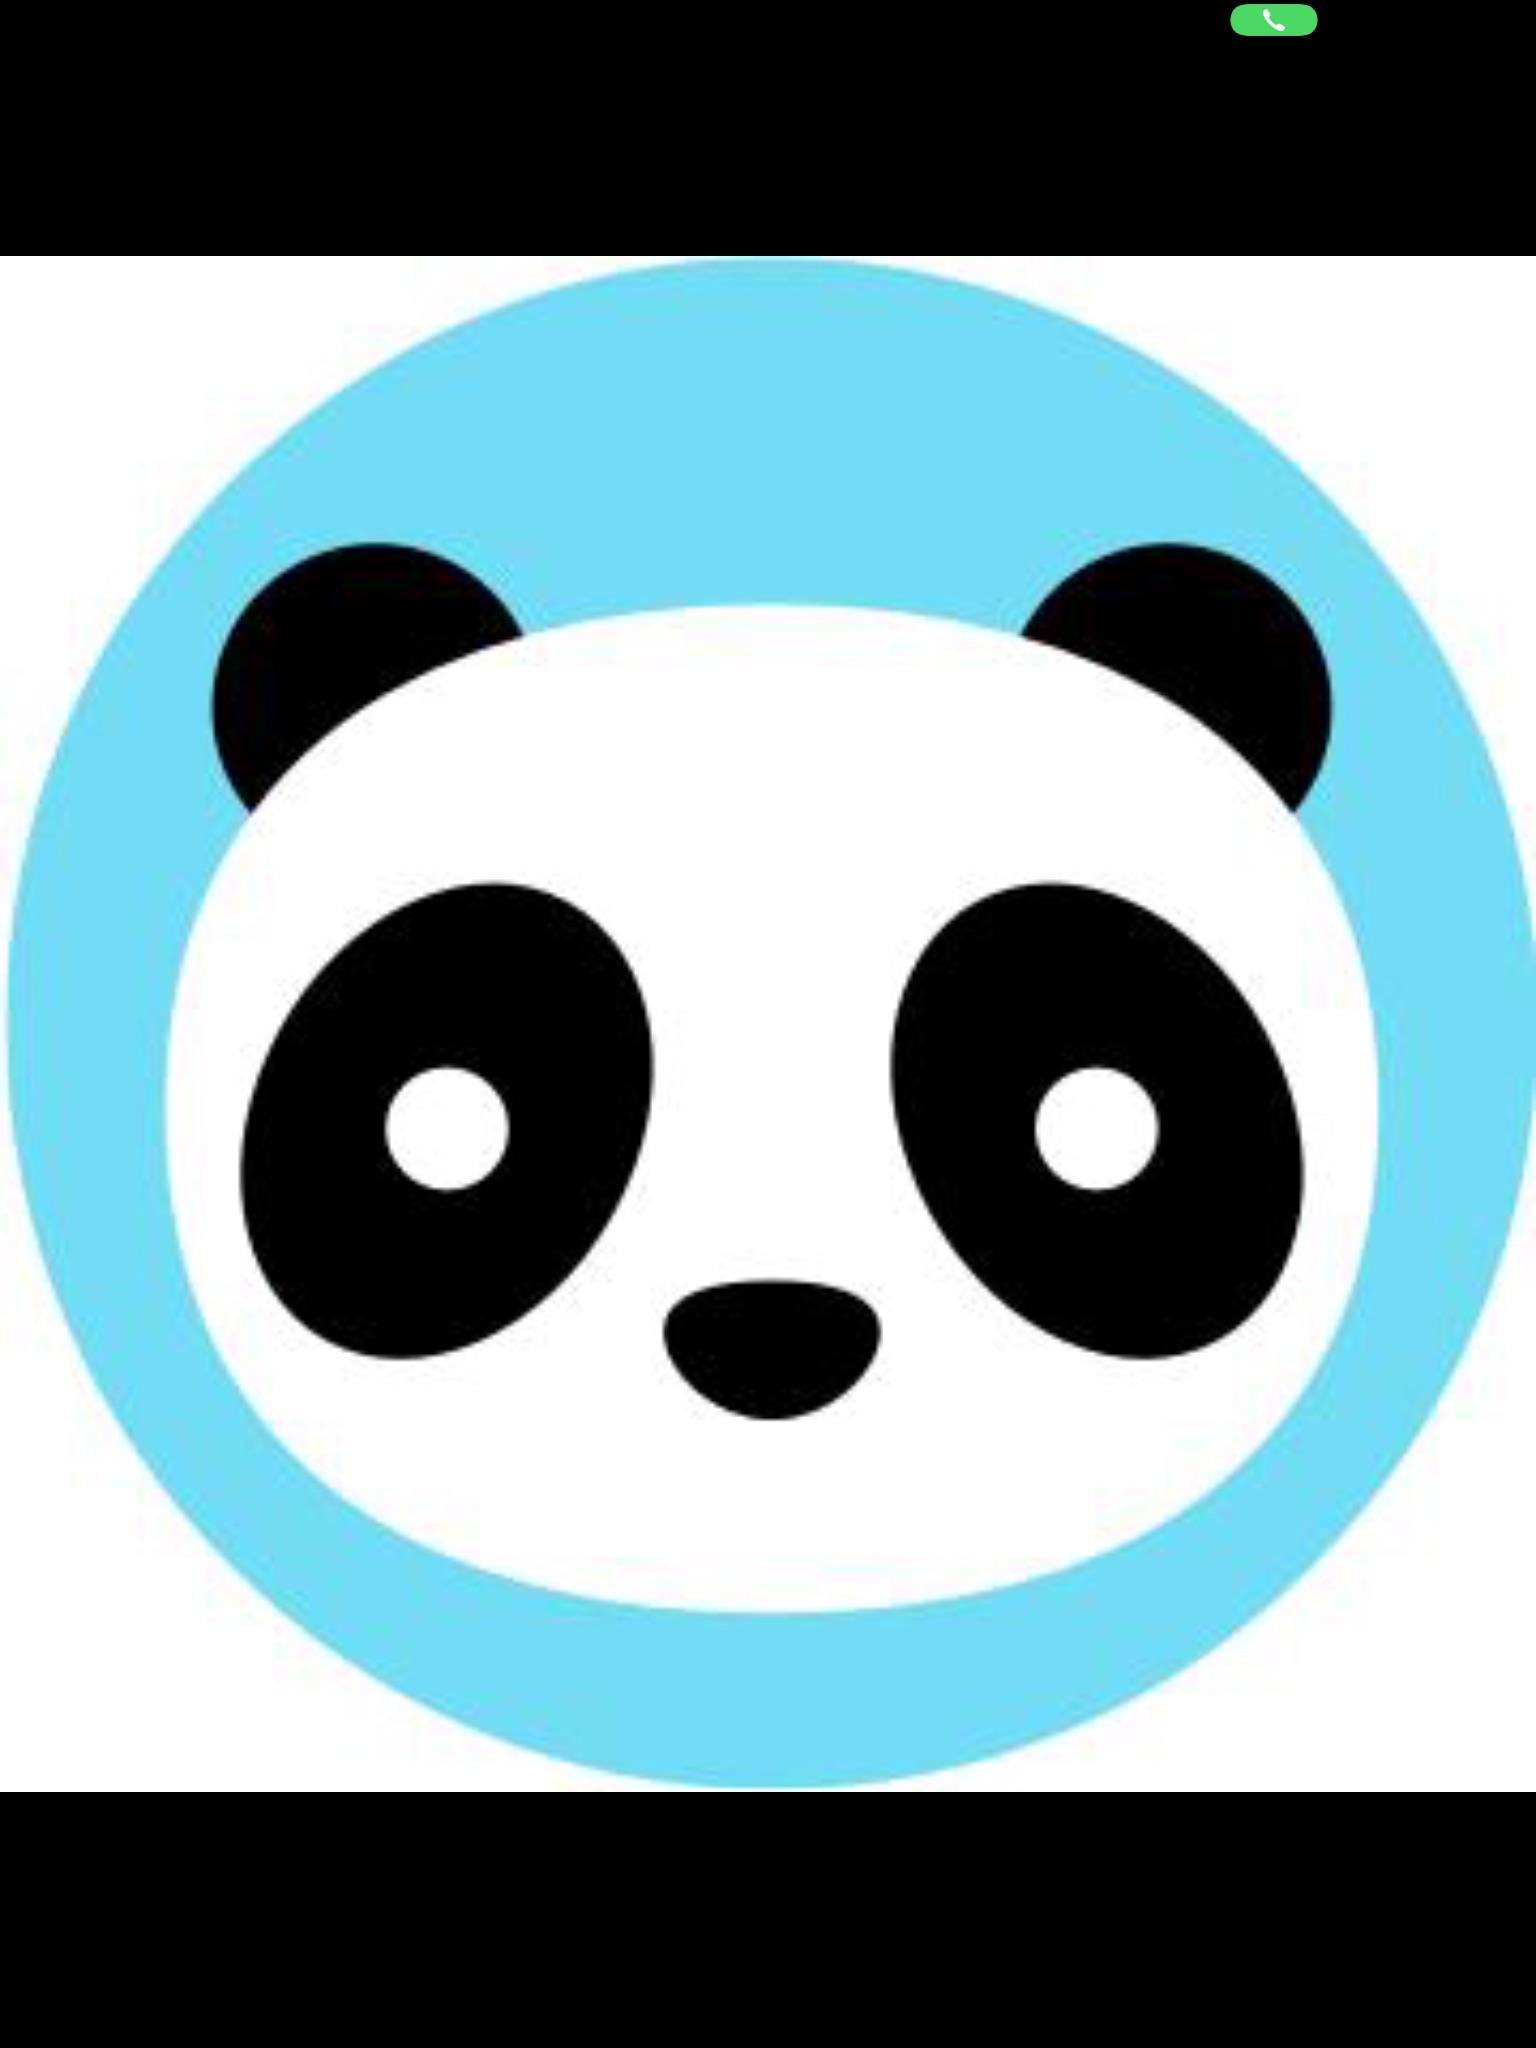 CK Fox's avatar